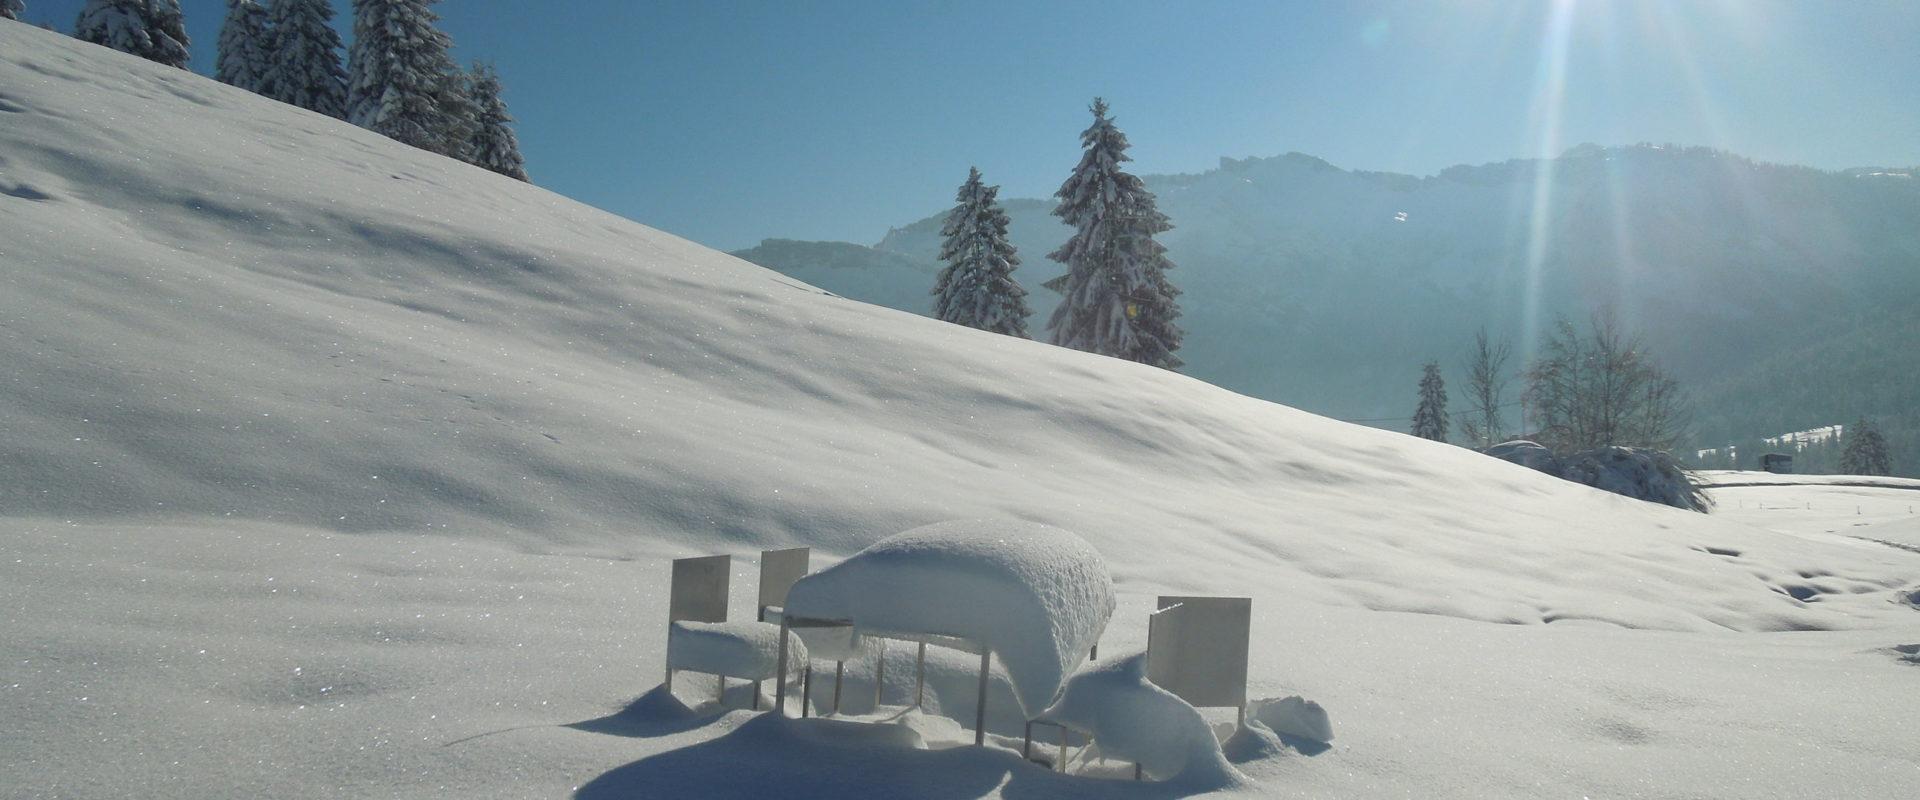 Winterwandern Georunde Rindberg Sibratsgfaell © Stadelmann/Verein